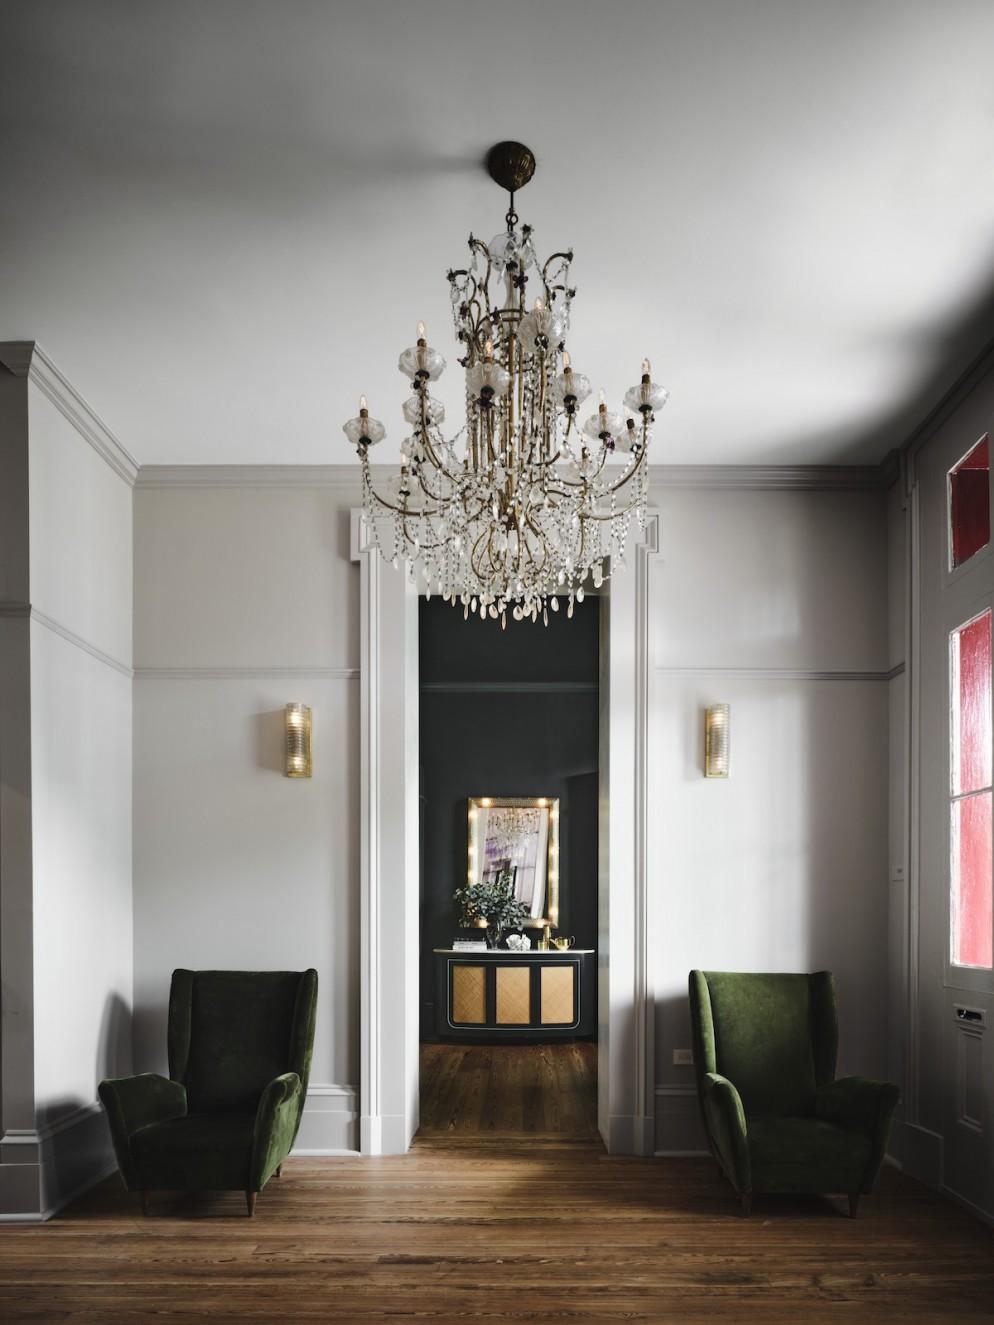 Hotel Saint Vincent -  Lobby 02 - by Douglas Friedman